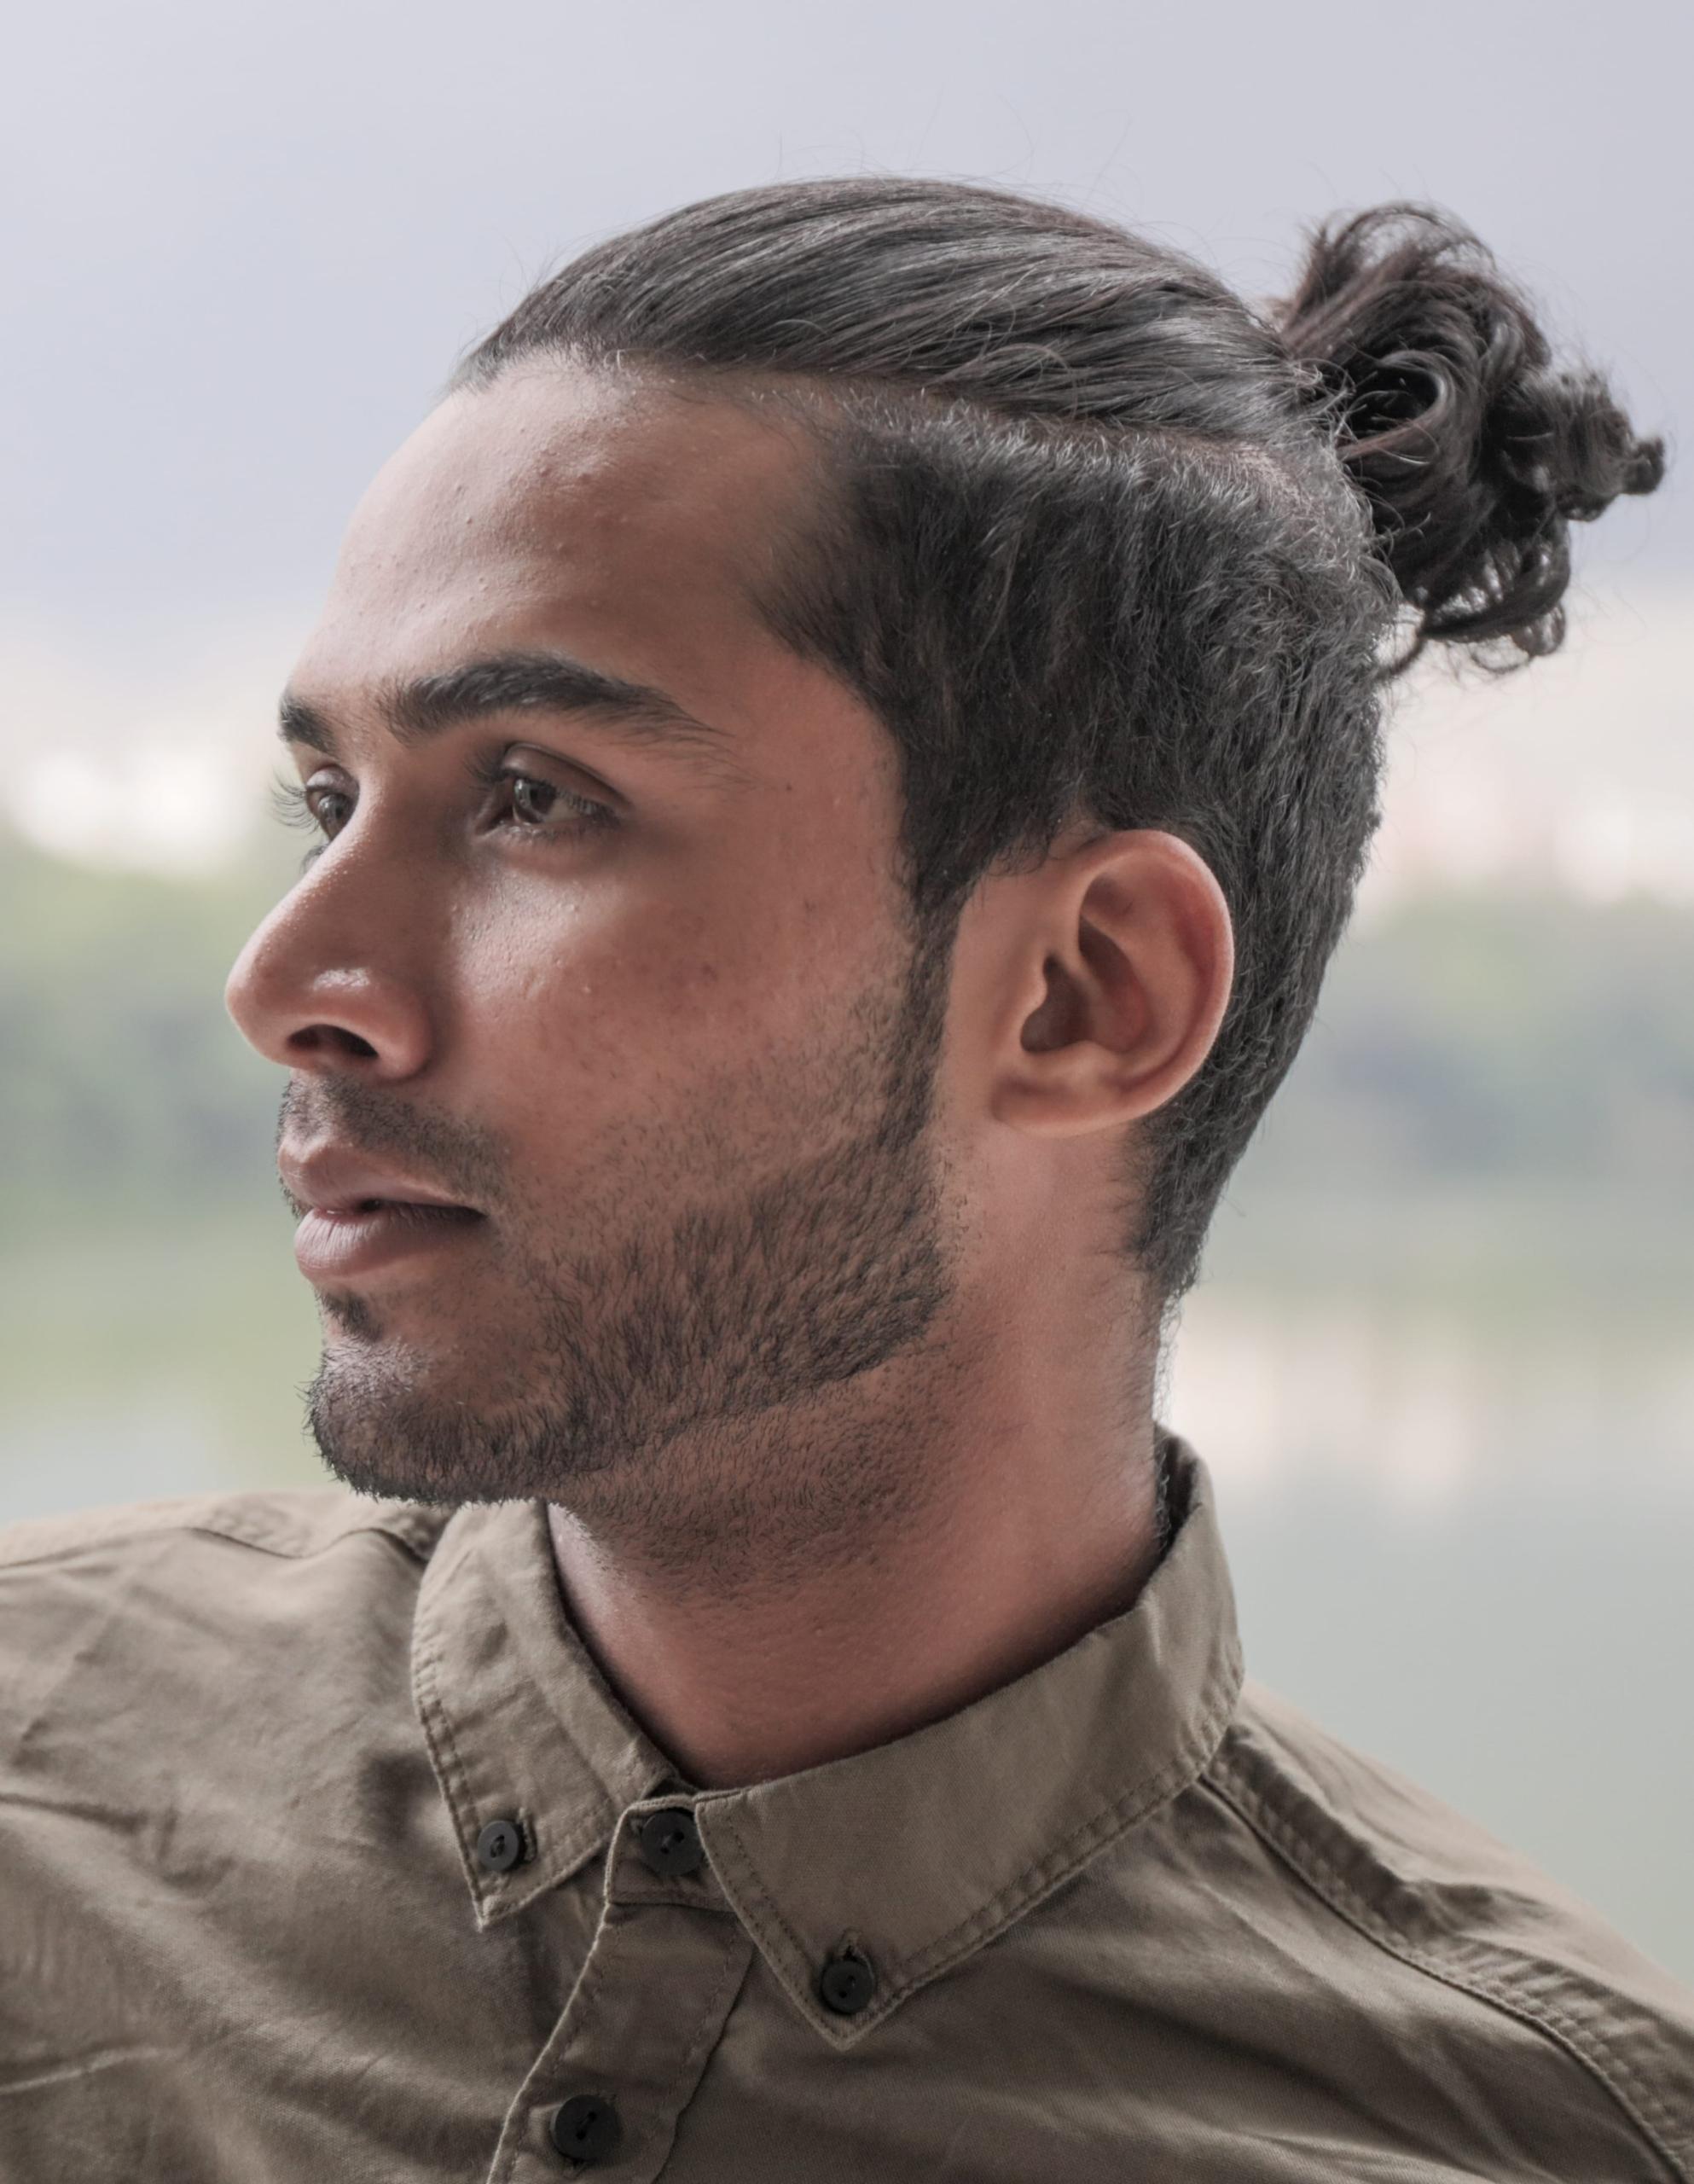 Top Knot Hair Model Ideas